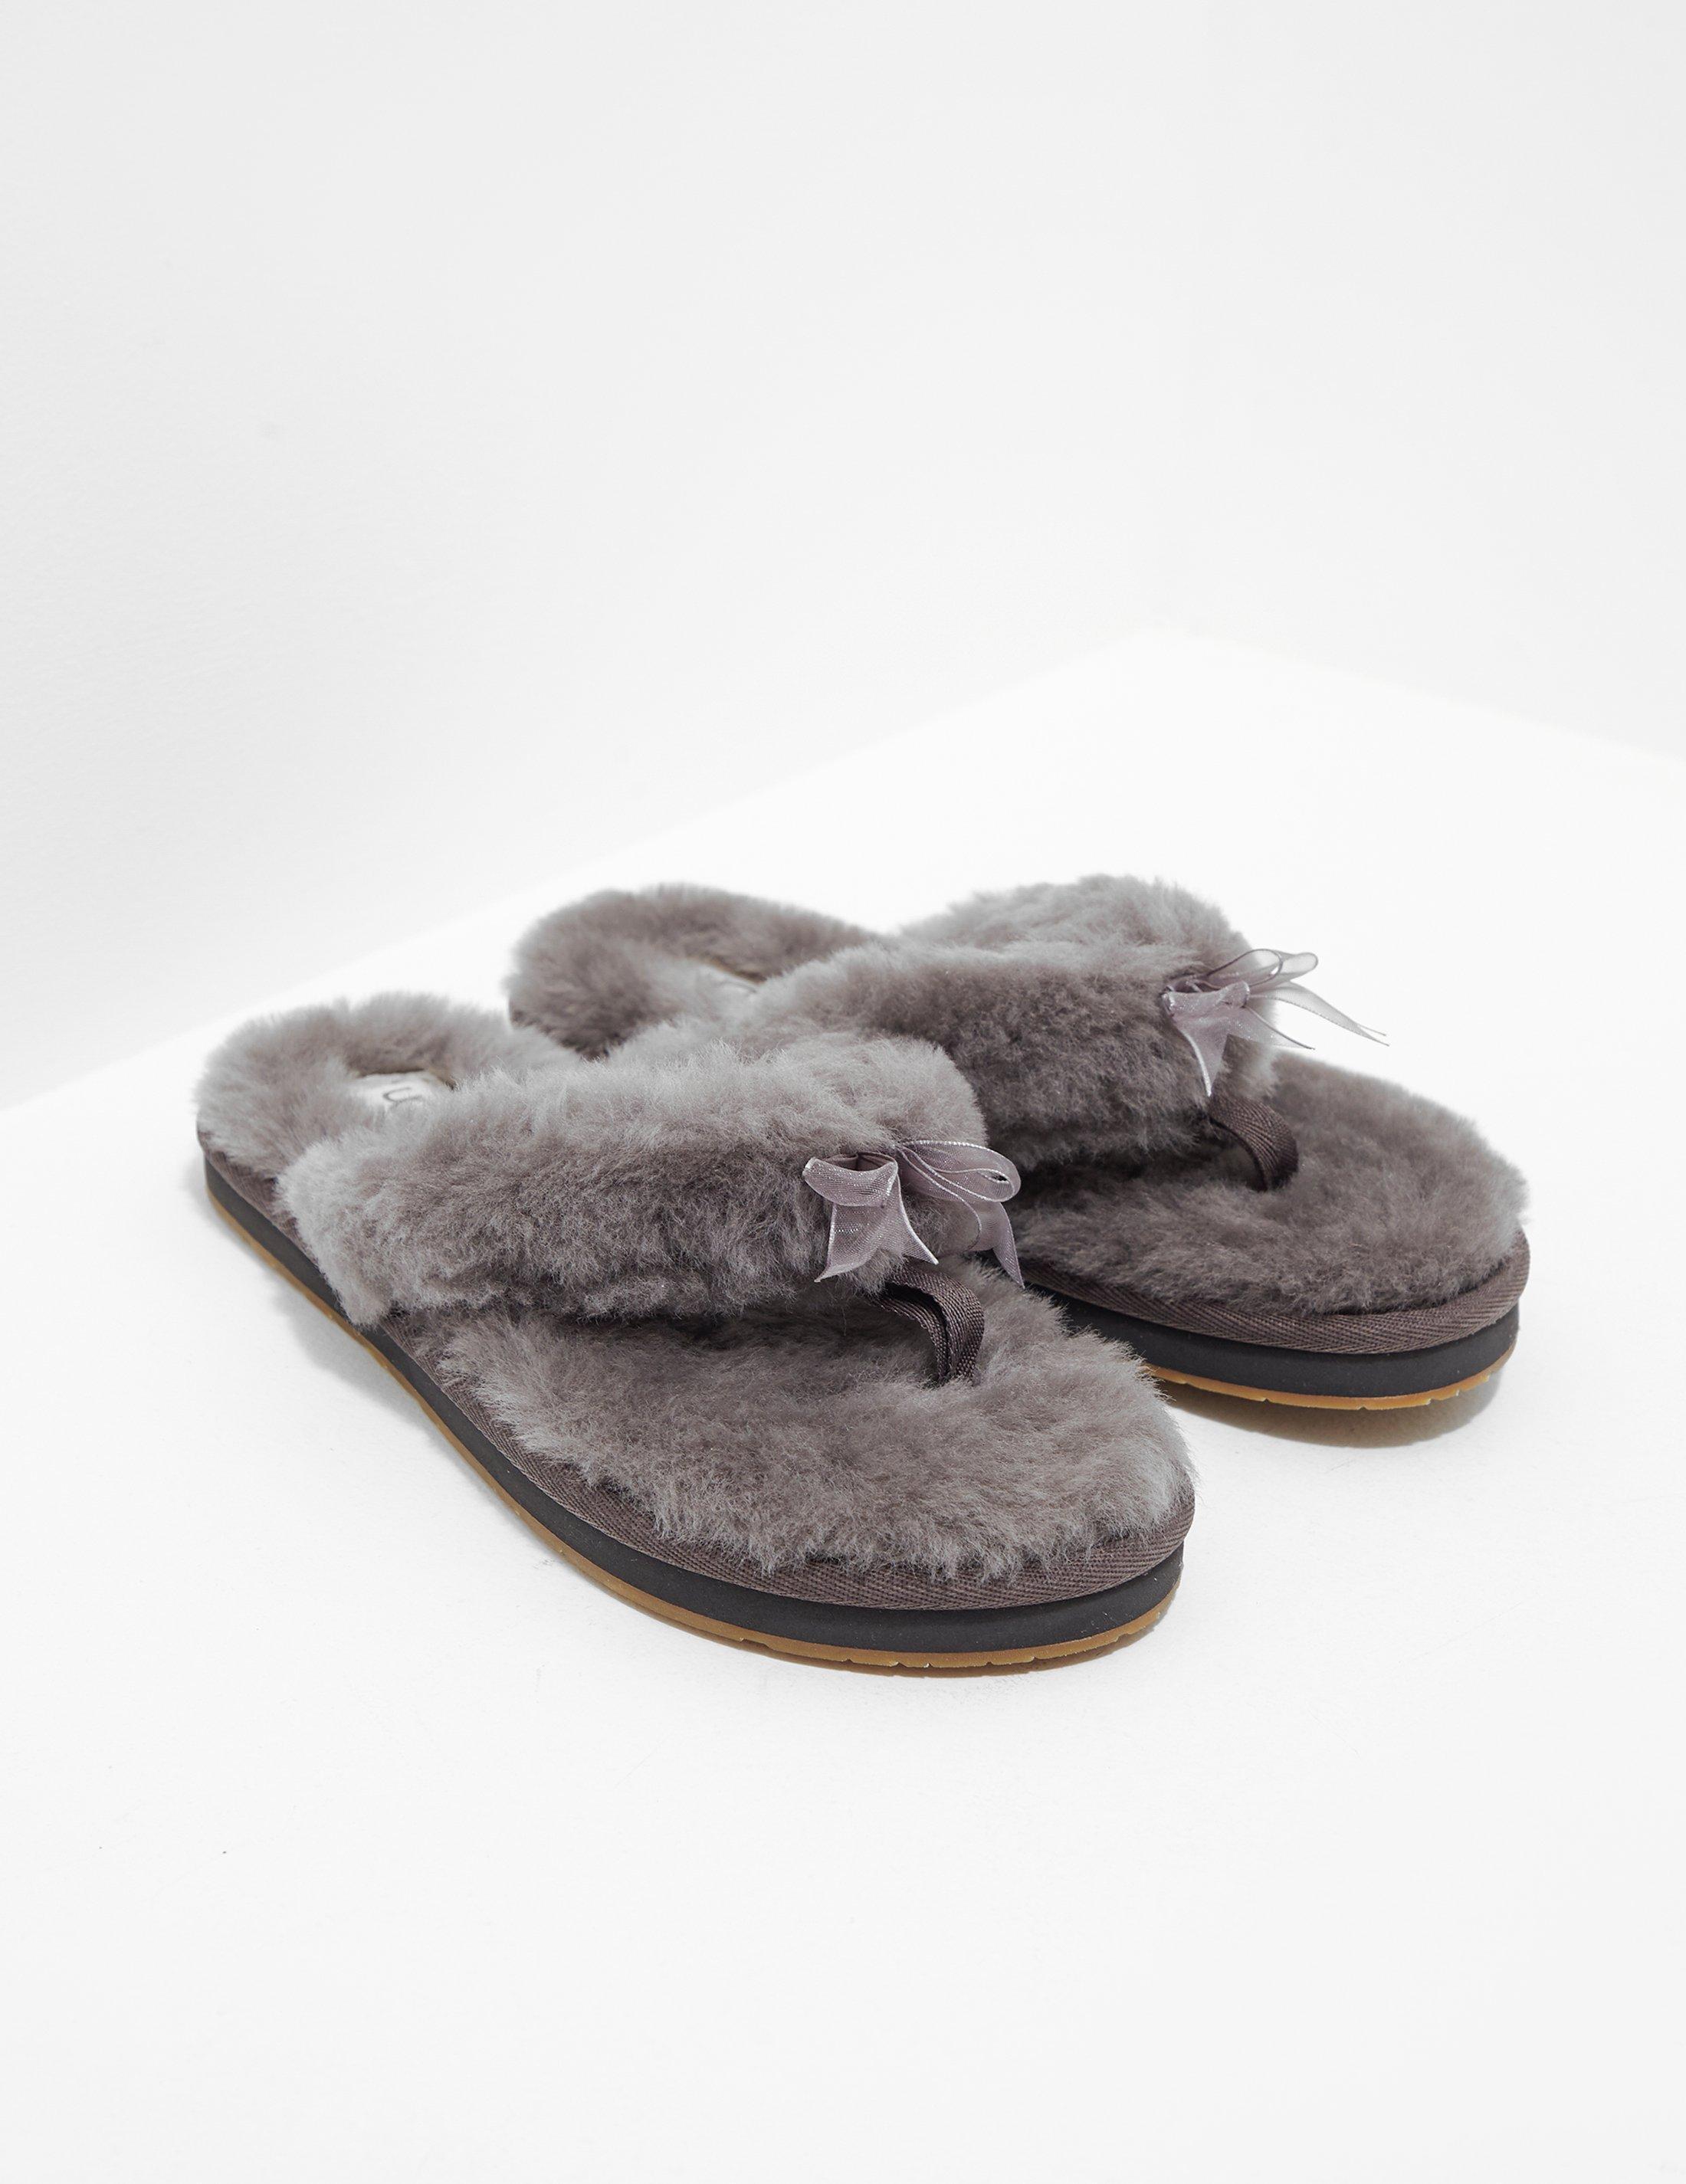 babc4816681 Lyst - UGG Womens Fluffy Flip Flops Grey in Gray